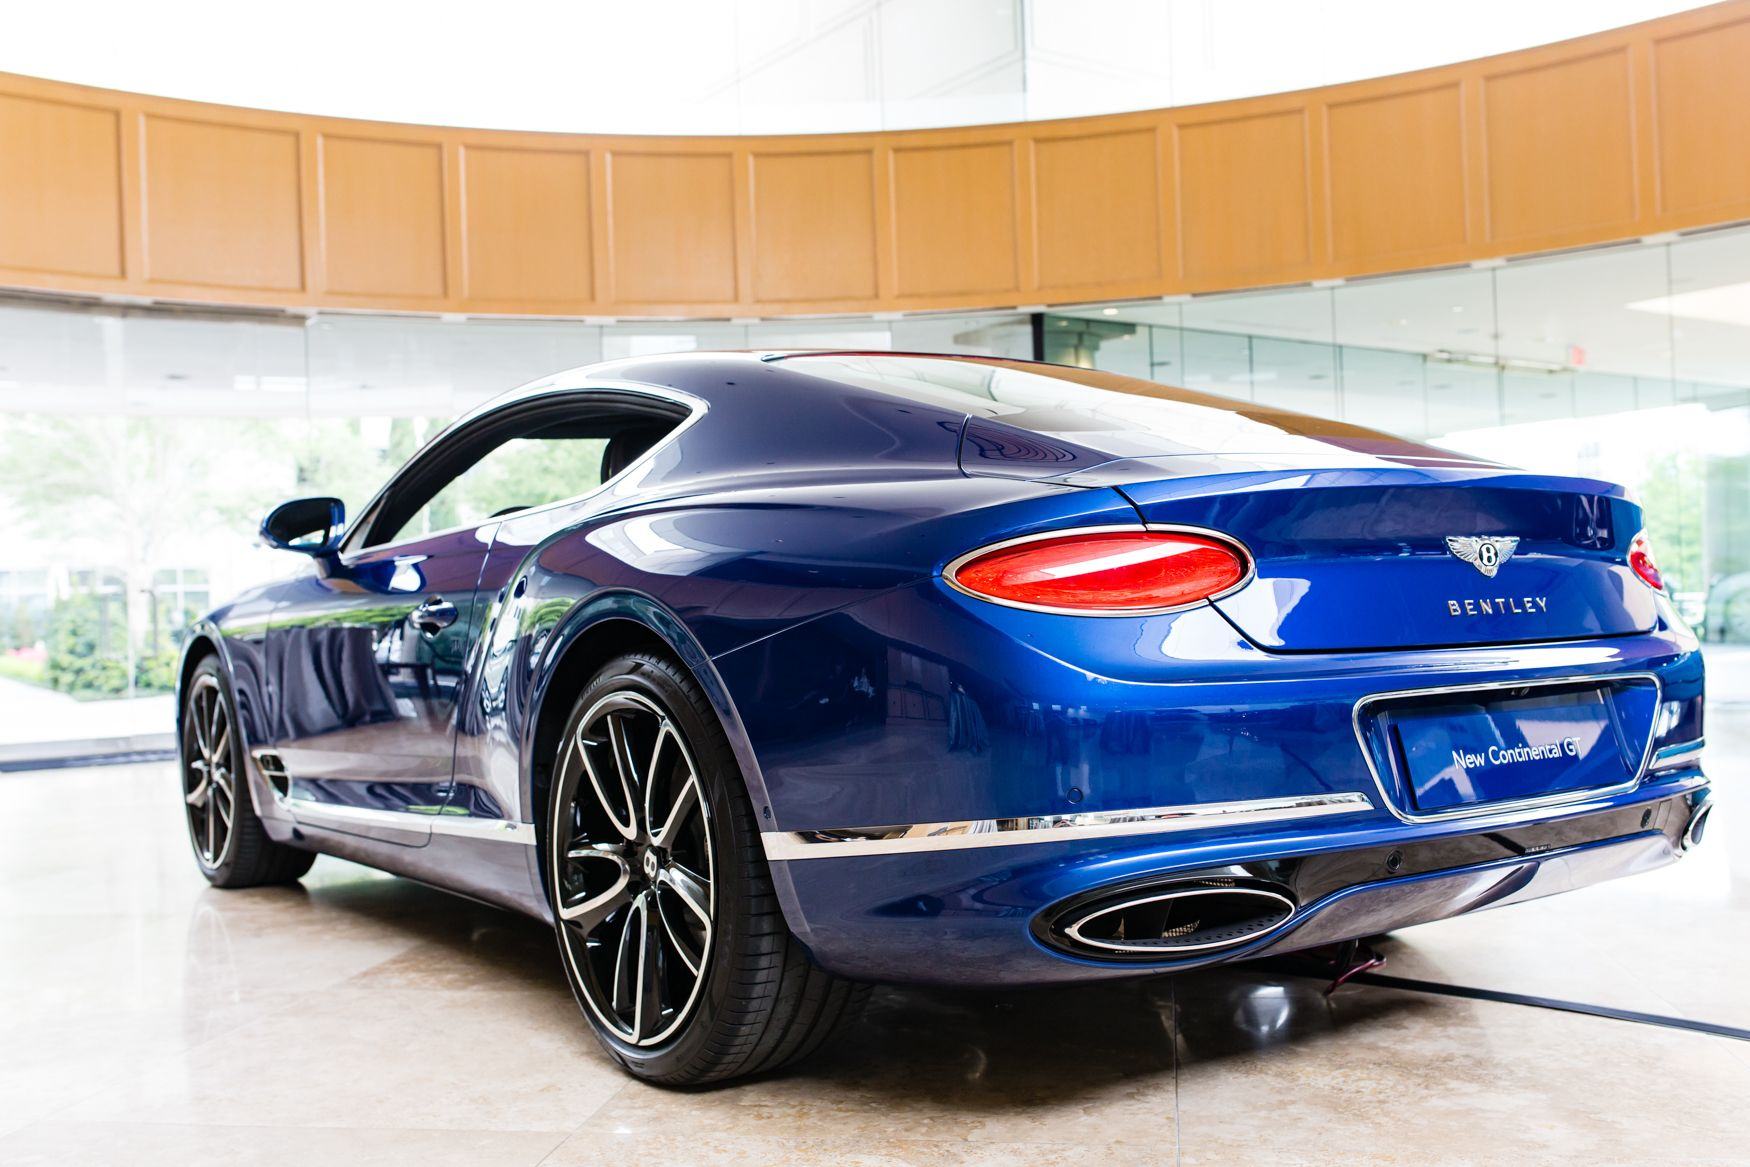 New 2019 Bentley Continental Gt From Bentley Houston Bentley Motor Car Bugatti